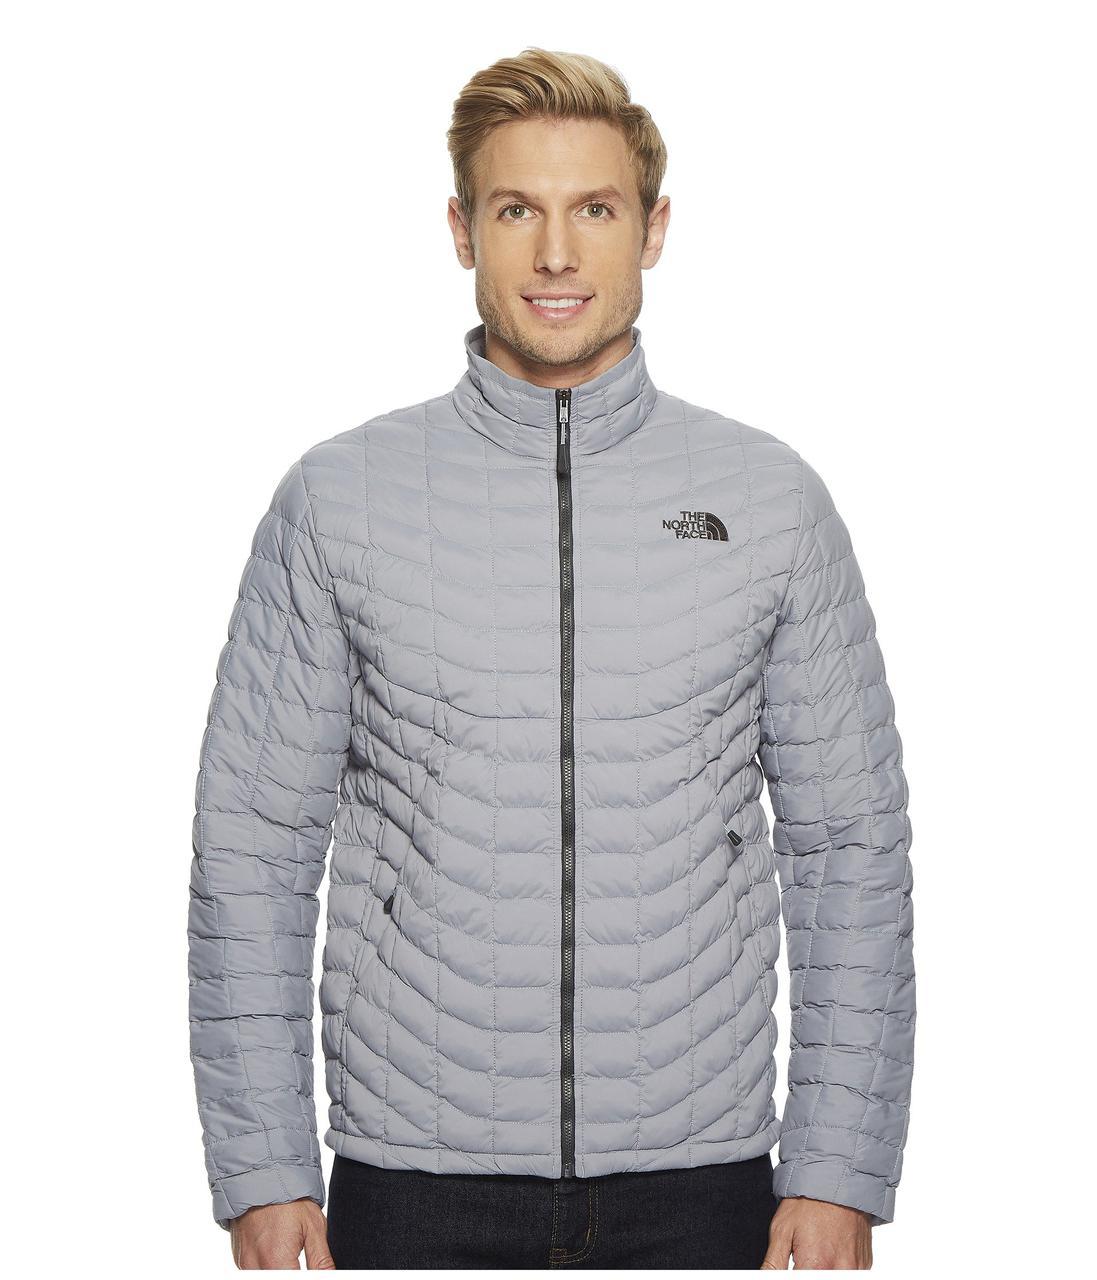 f4f80c99e9bea Зимняя Куртка The North Face Stretch ThermoBall Full Zip Mid Grey -  Оригинал — в Категории